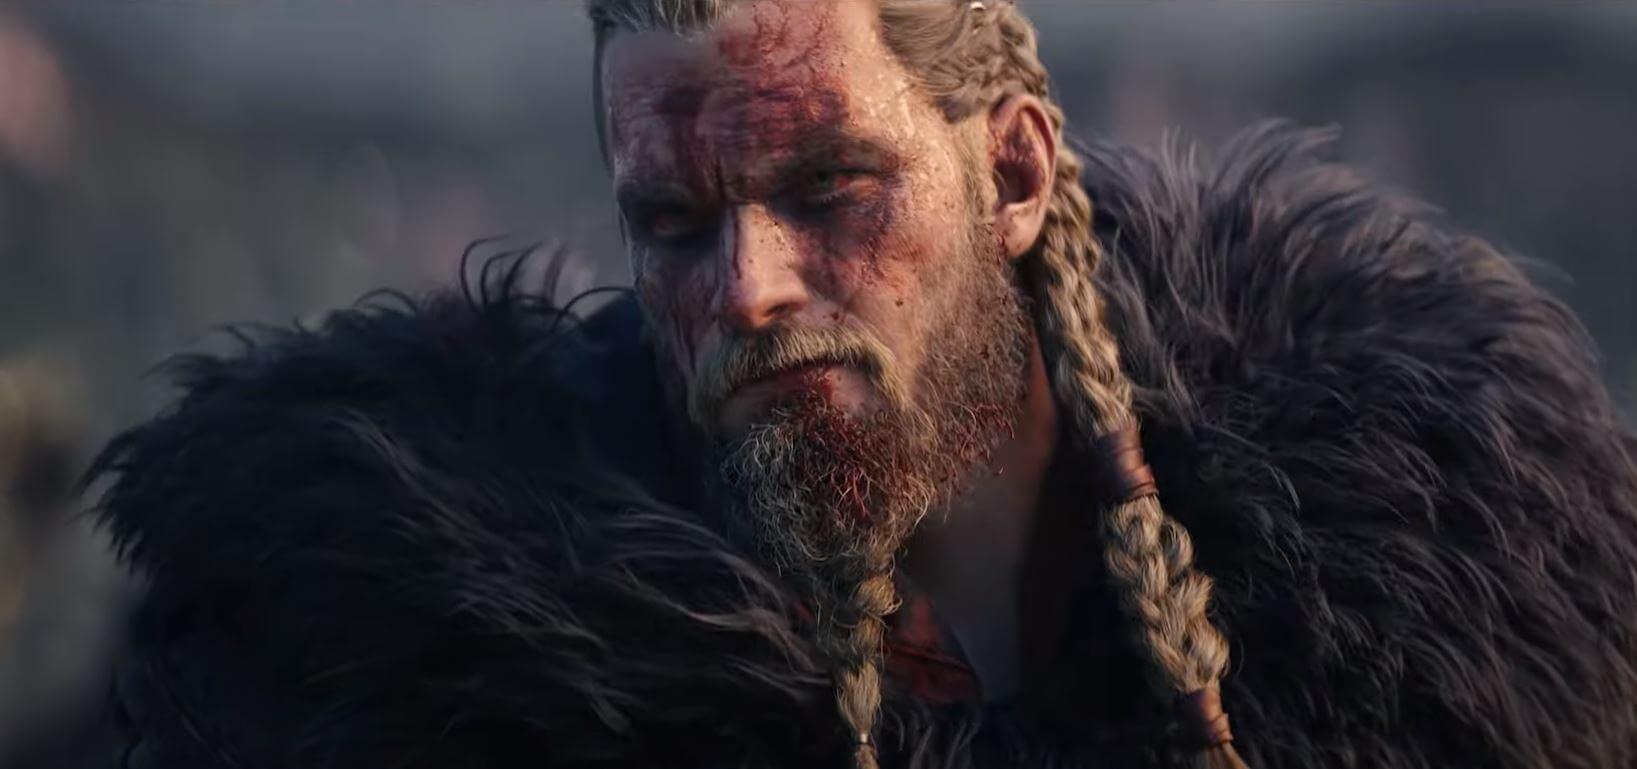 Assassin's Creed Valhalla: Confira o primeiro trailer na era viking